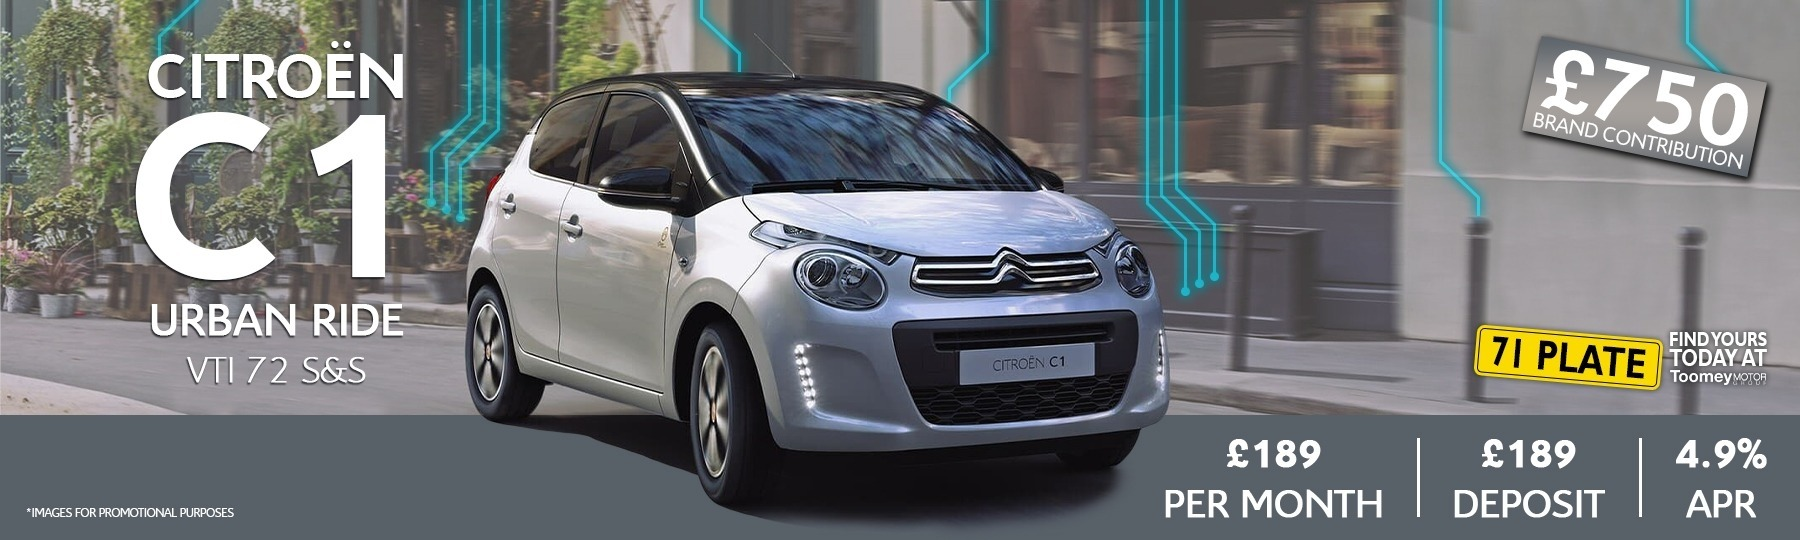 citroen C1 New Car Offer